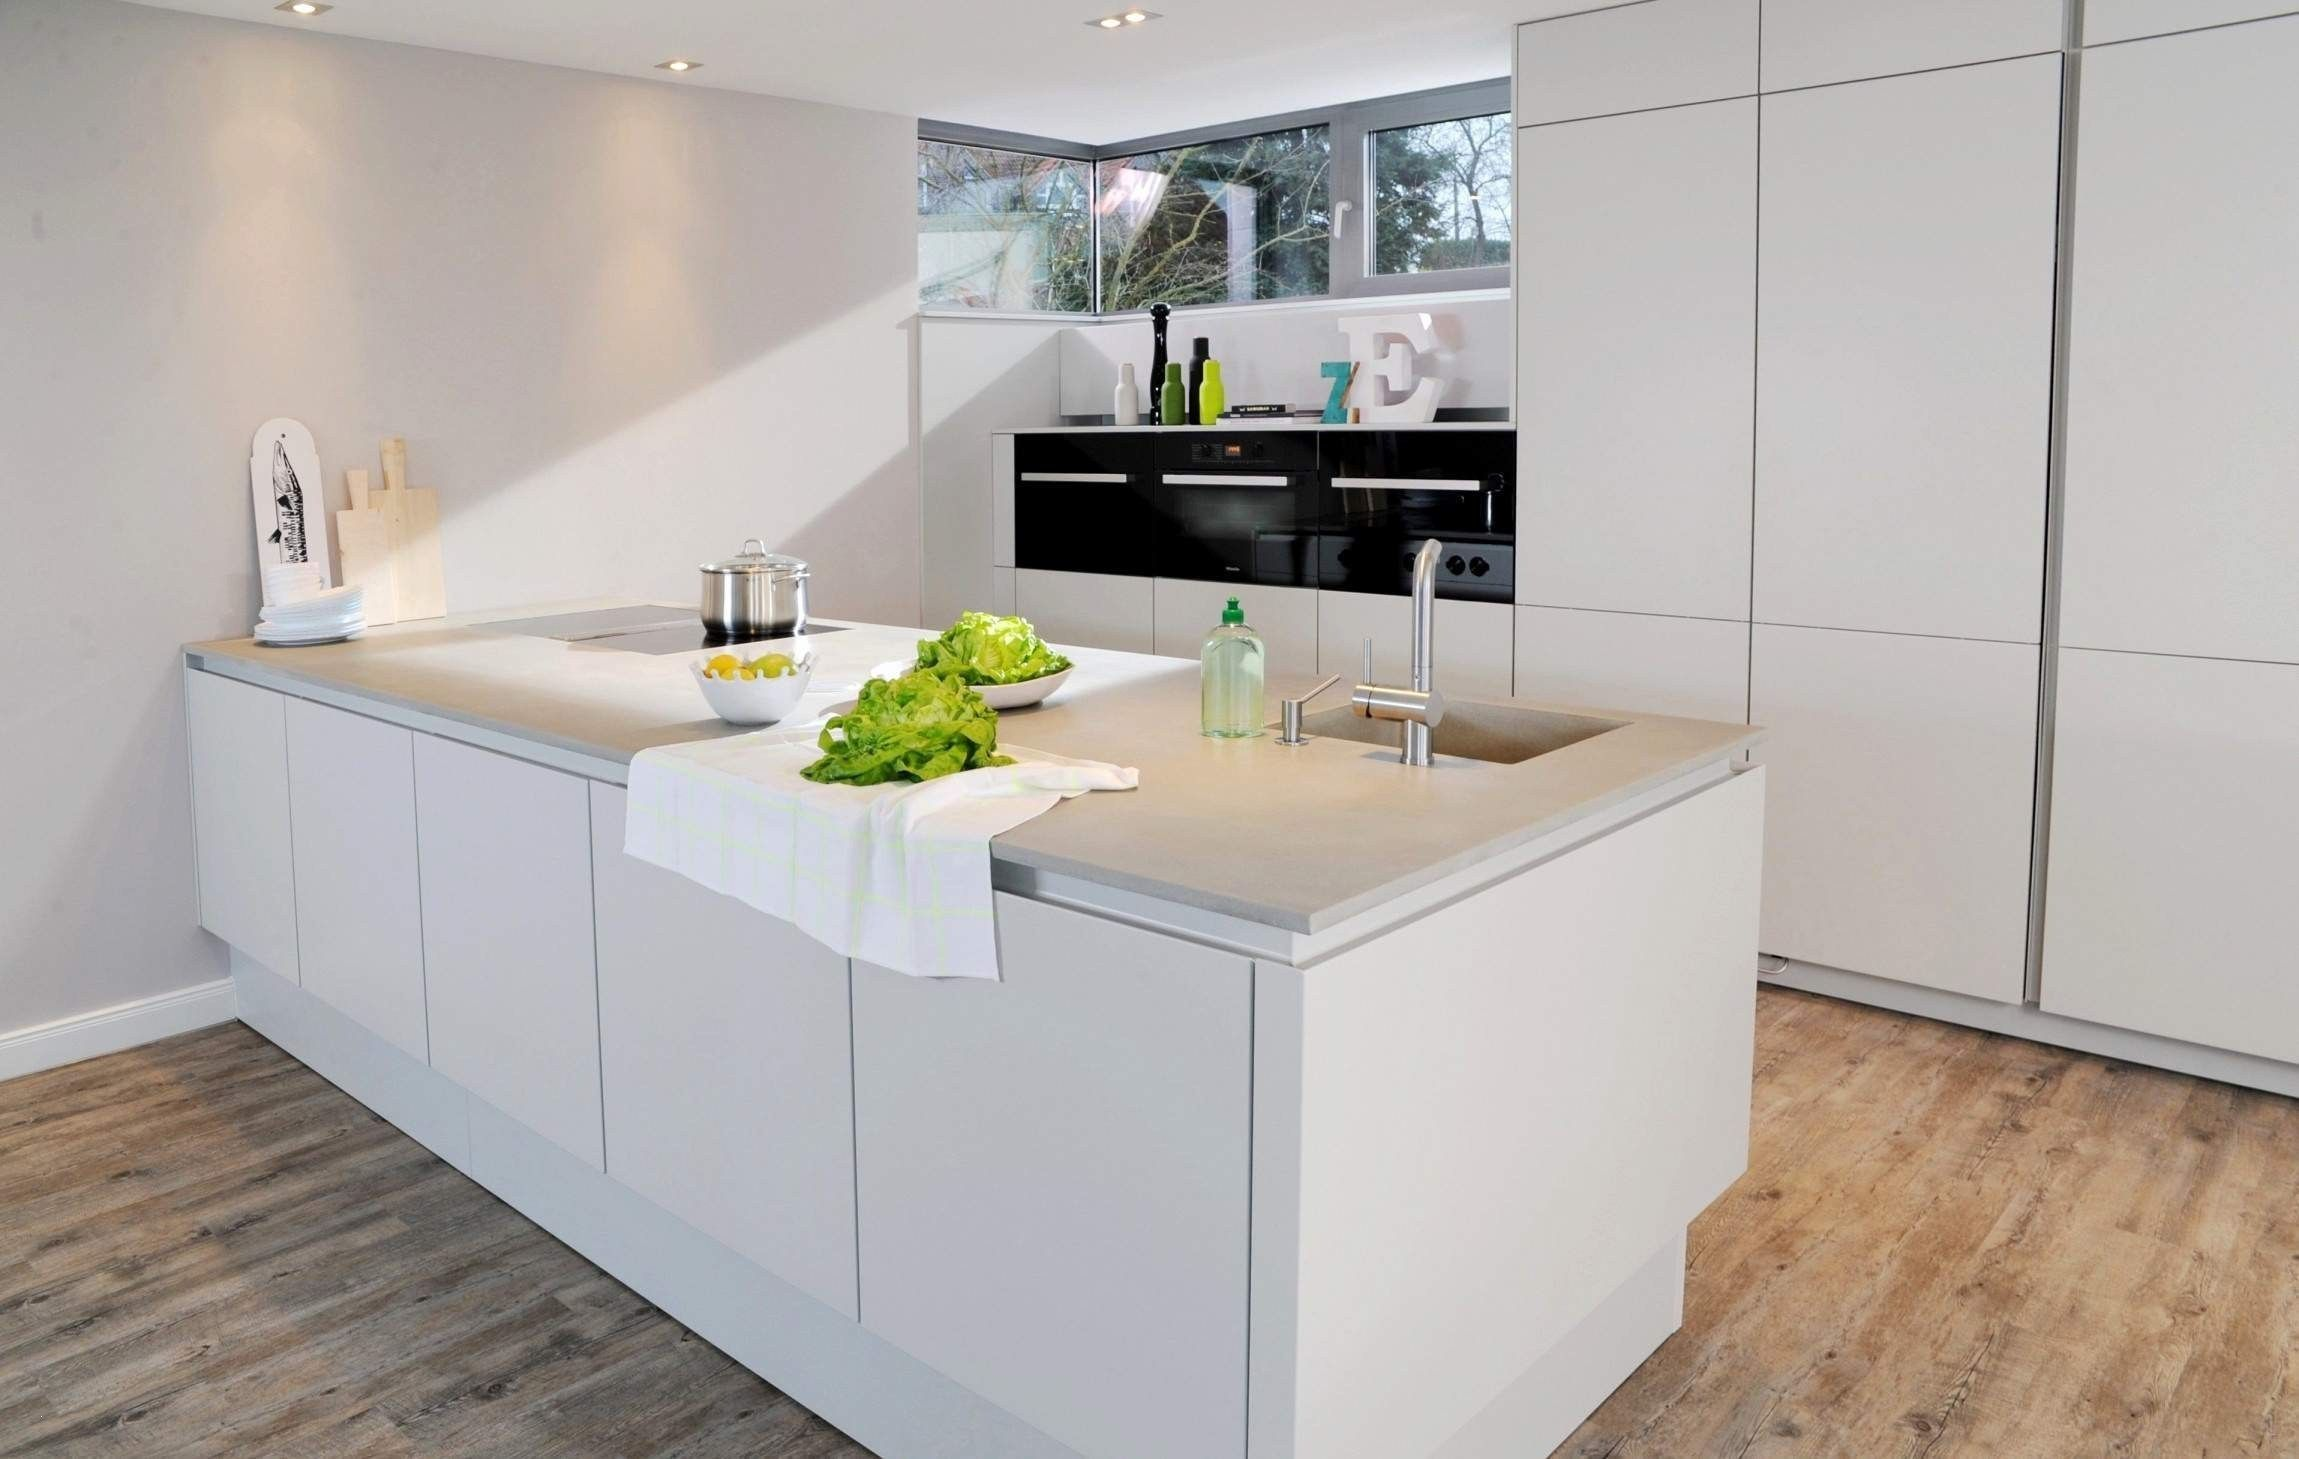 Ikea Kuche Arbeitsplatte Ikea Metod Kitchen Off White Bobdyn Home White Kitchen Remodeling Ikea Kitchen Kitchen Decor